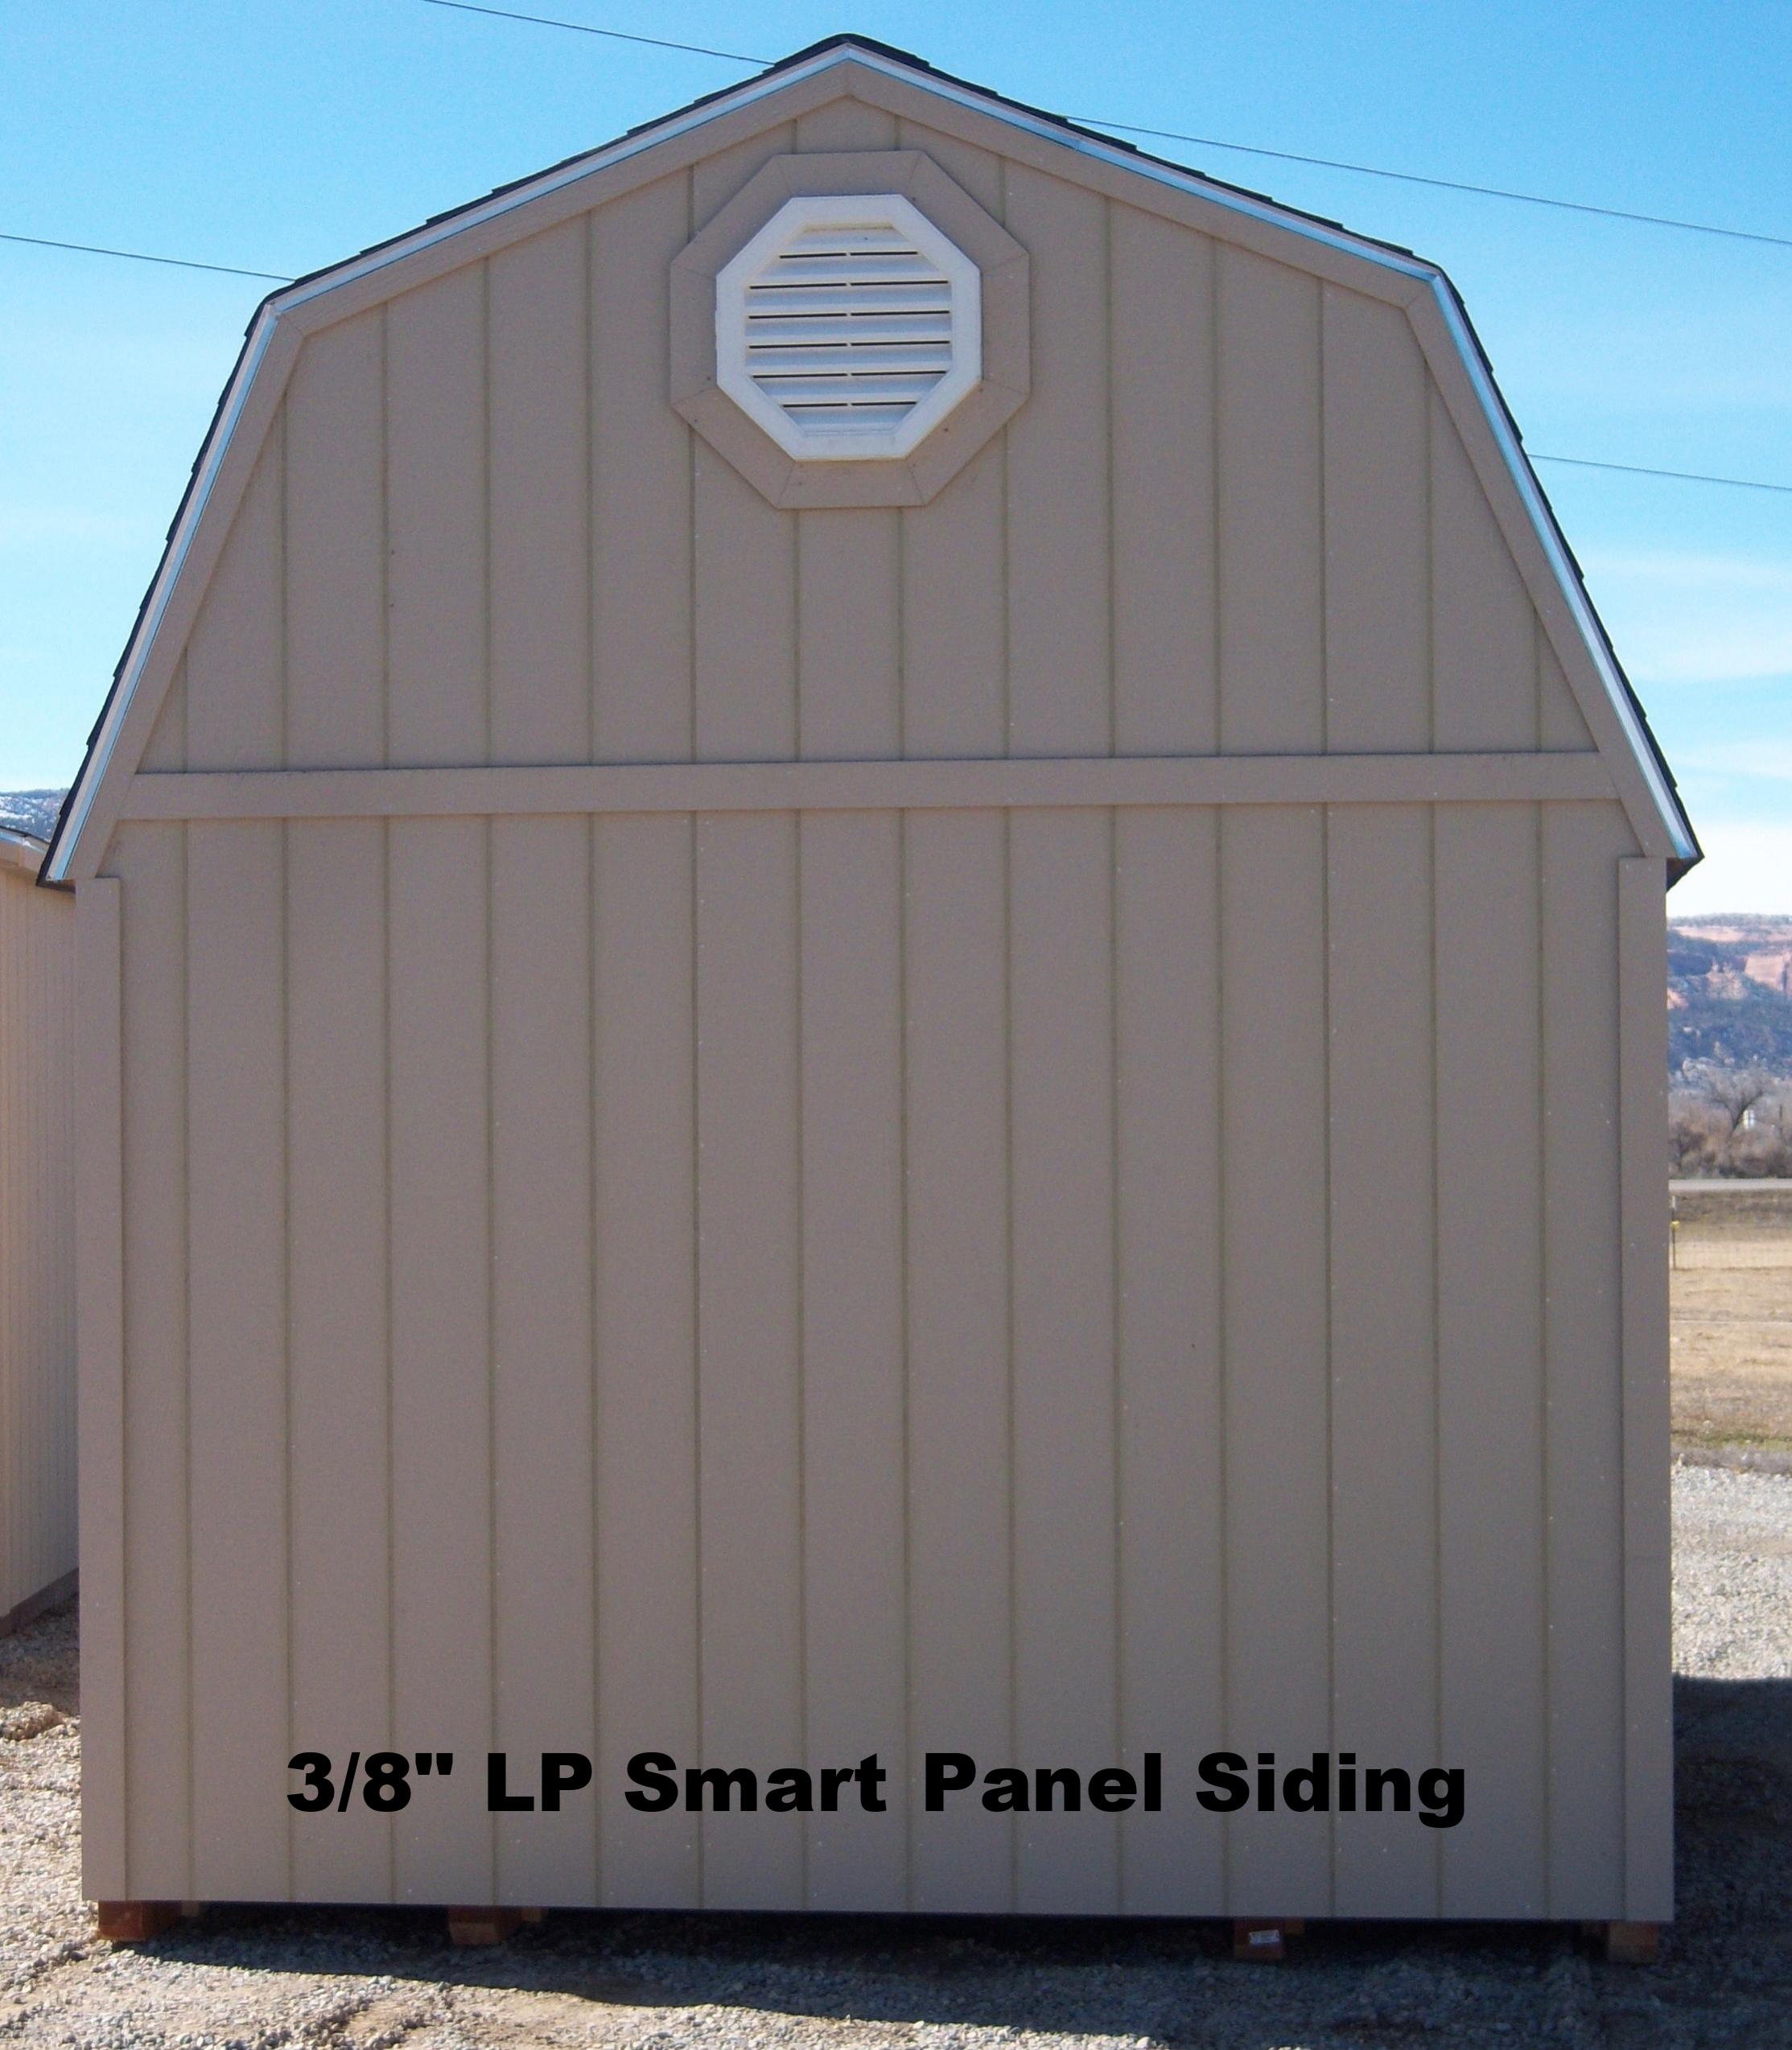 LP Smart Panel Siding & Trim